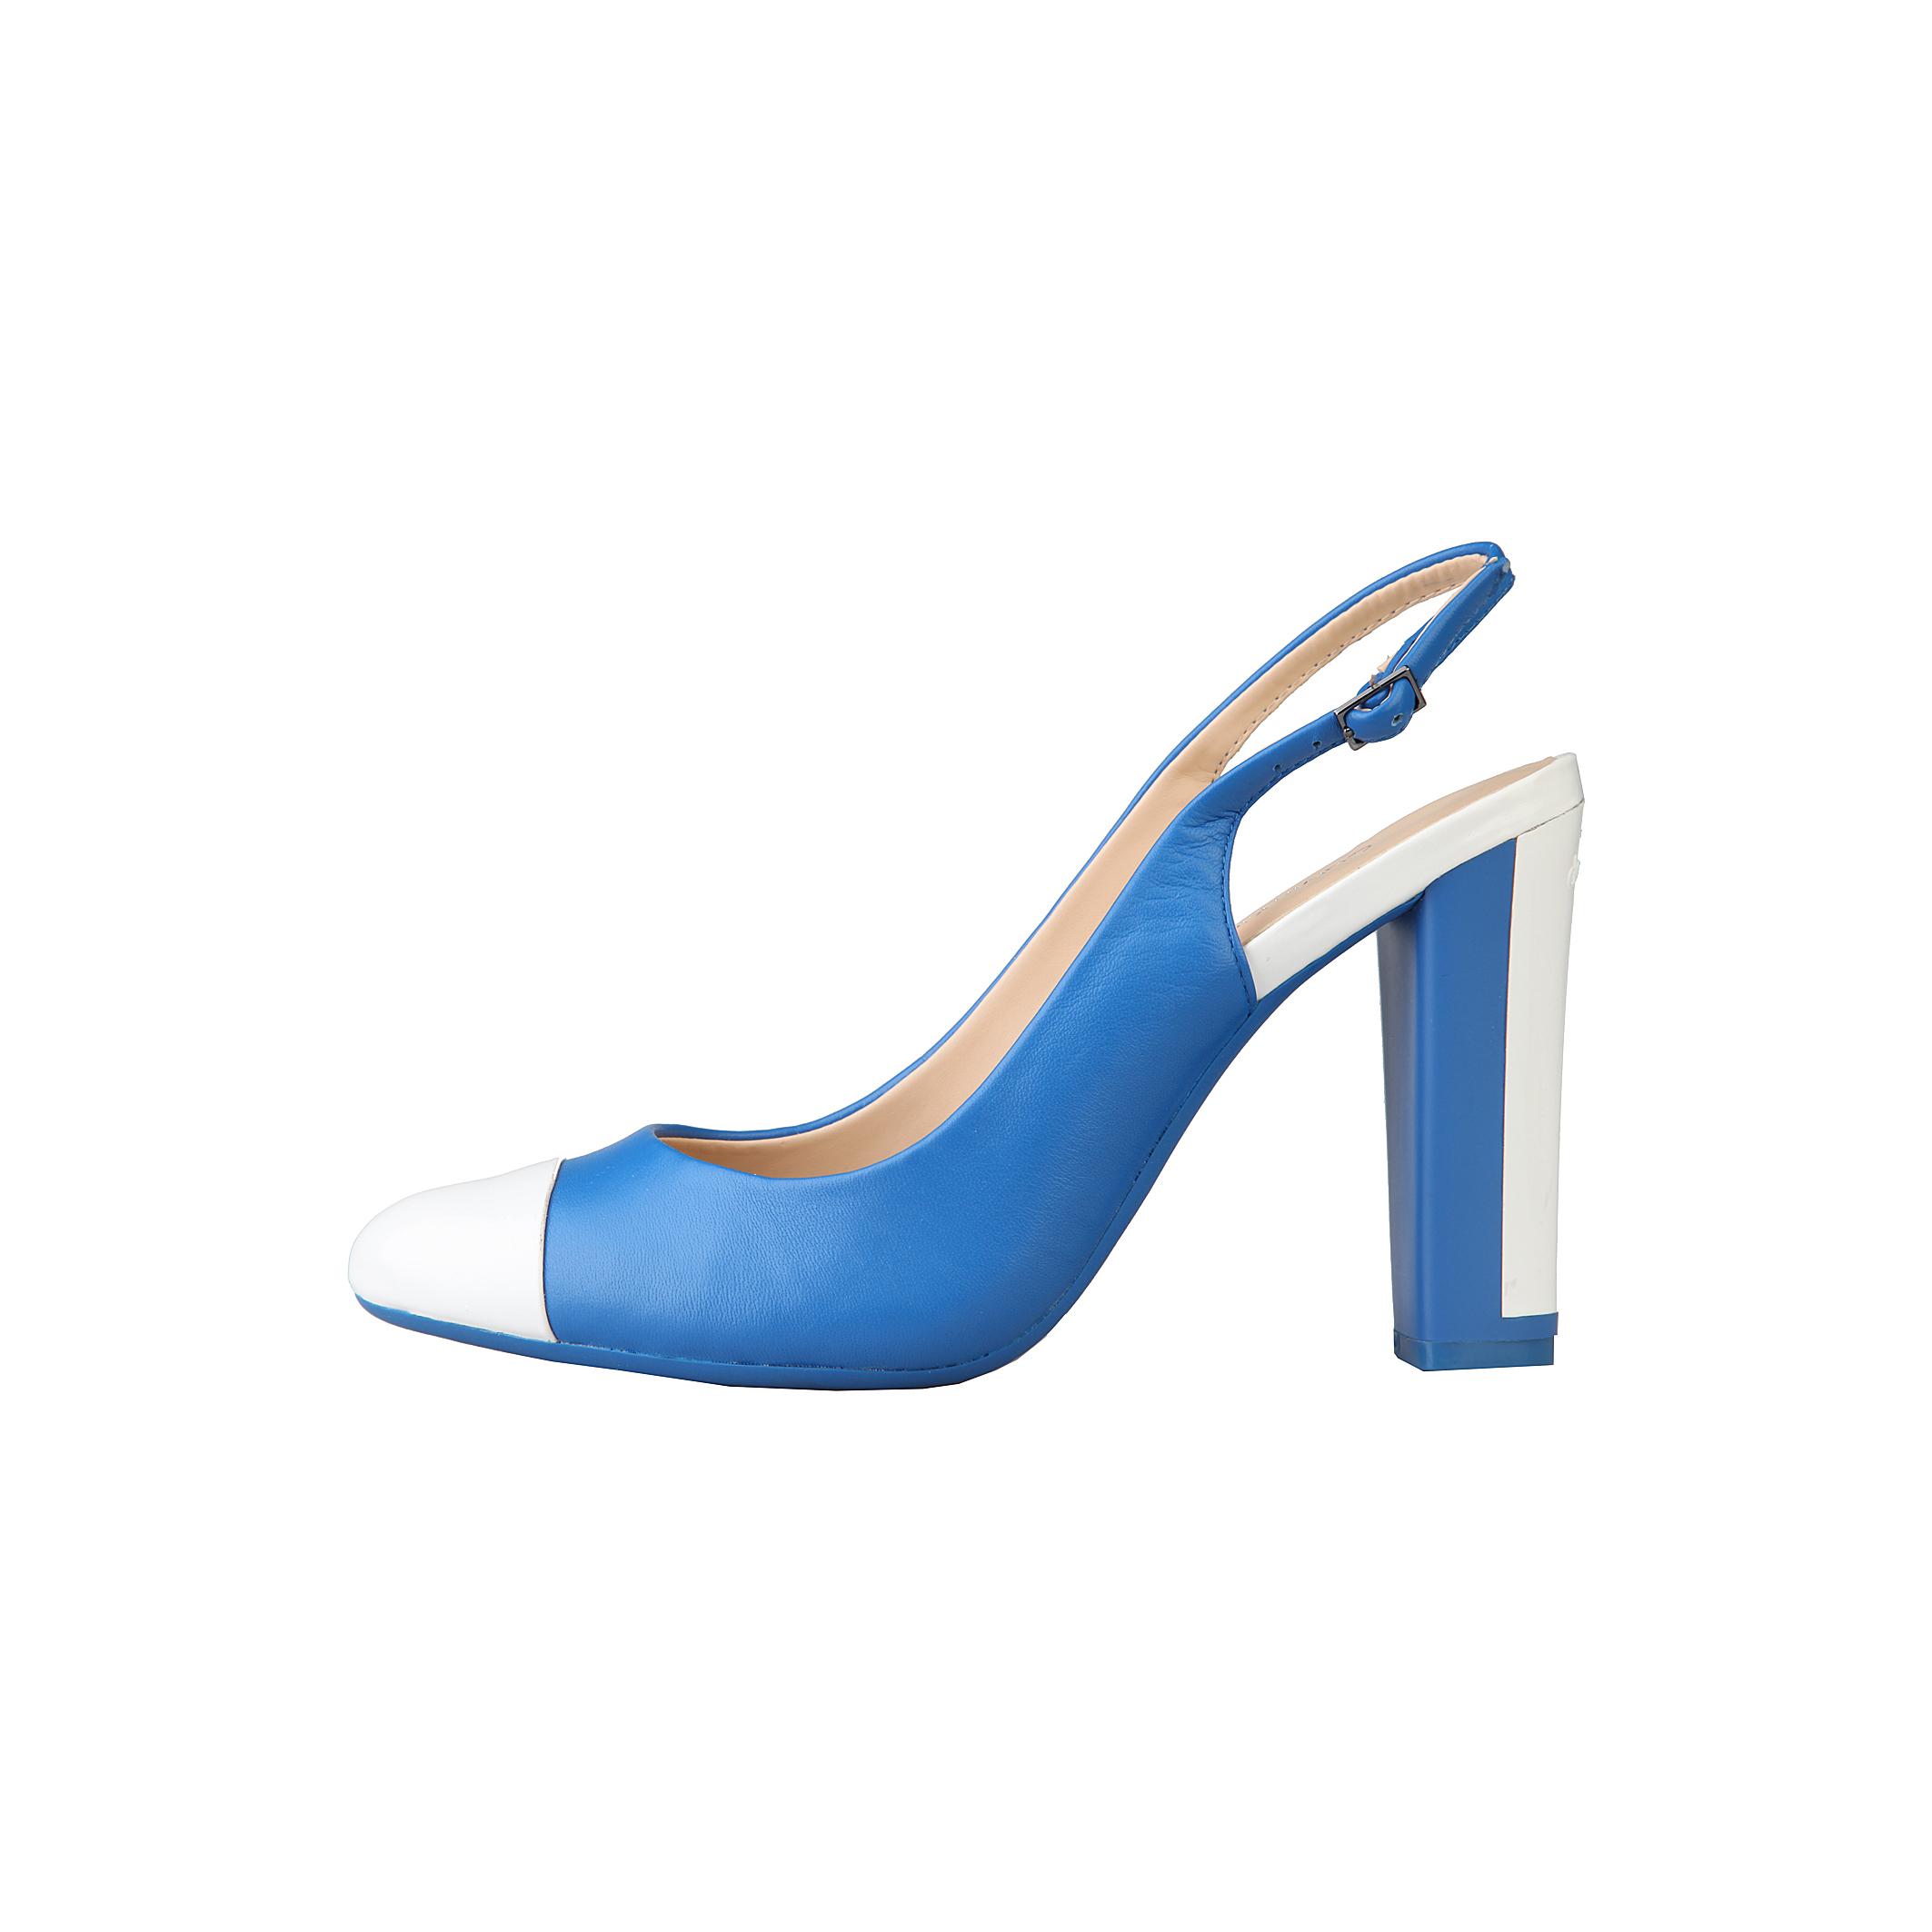 Sandali-Calvin-Klein-N11364-Donna-Blu-59326